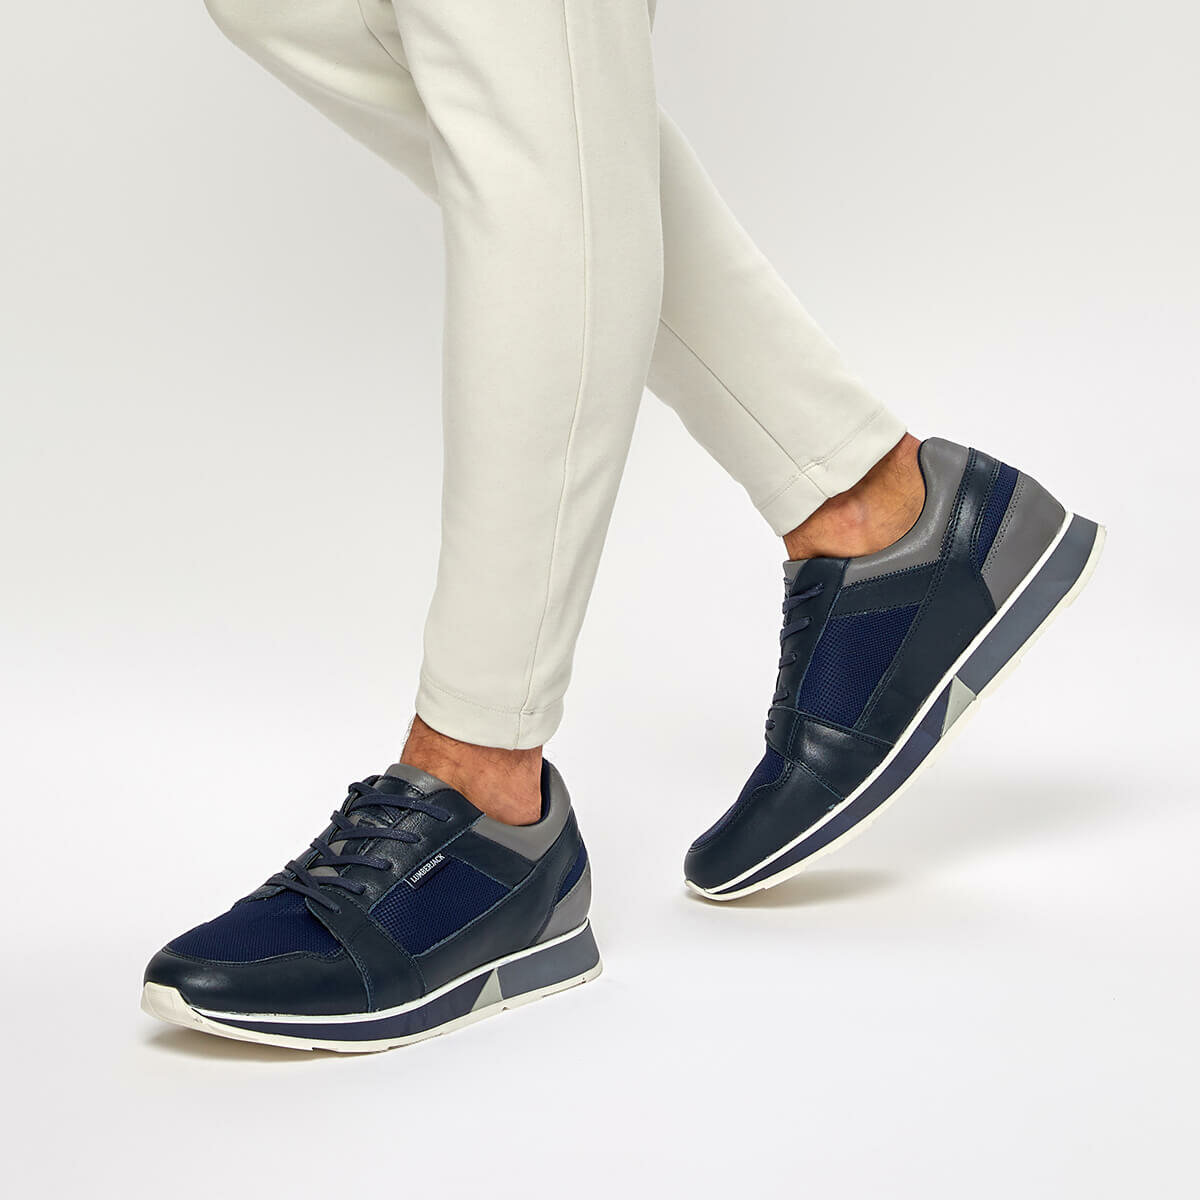 FLO TULSA Navy Blue Men 'S Sneaker Shoes LUMBERJACK